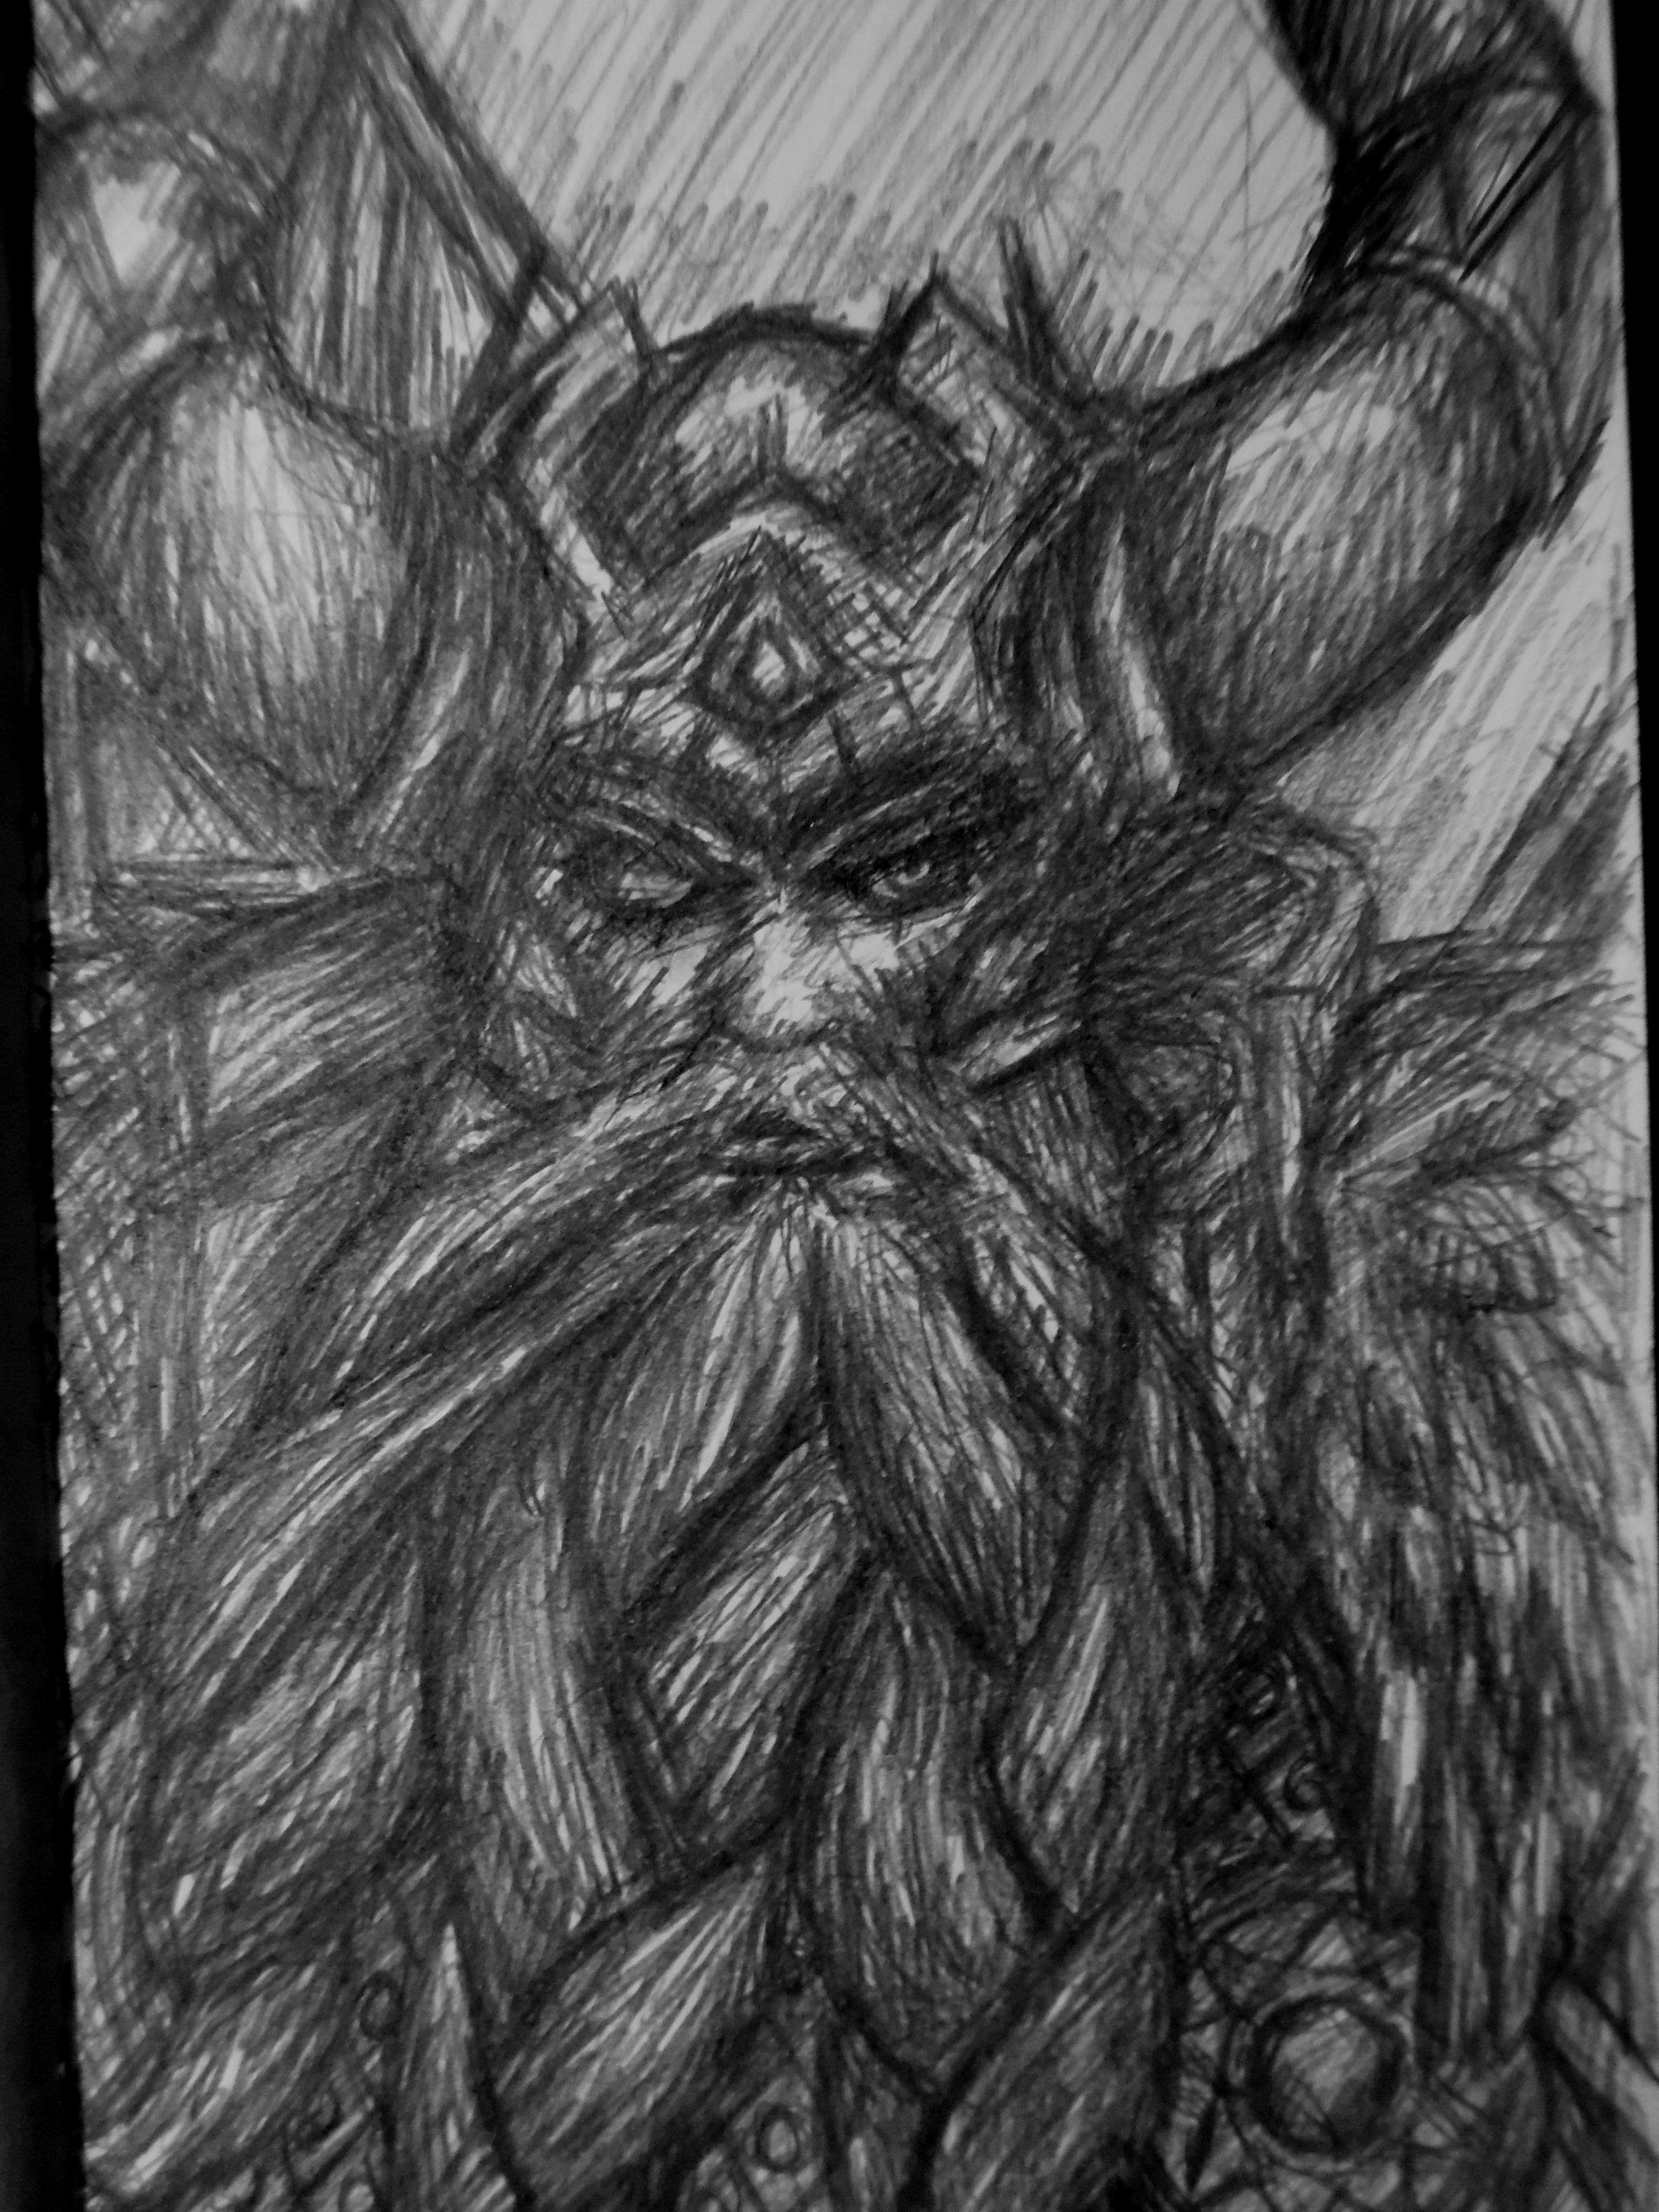 Odin - Smite by DerBananenMann on DeviantArt